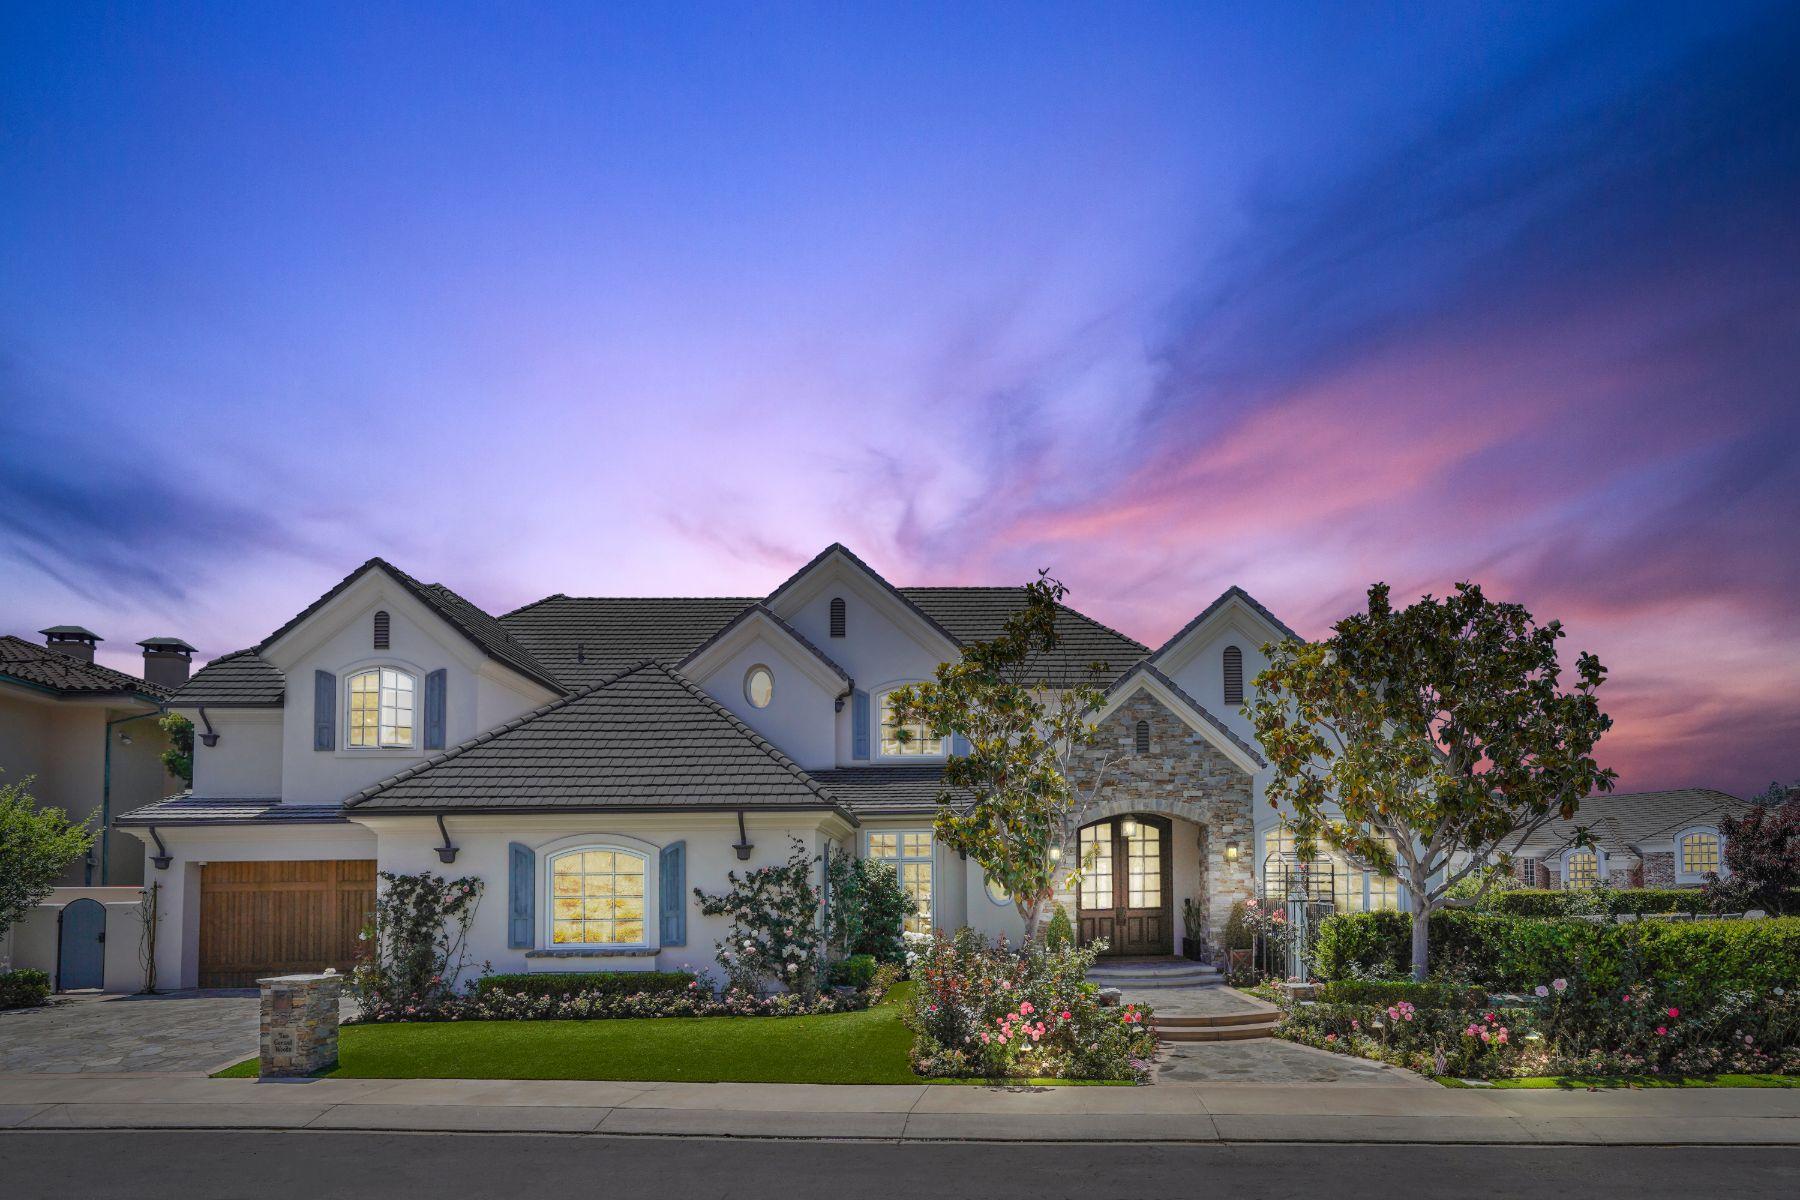 Single Family Homes for Sale at 2 Carmel Woods Laguna Niguel, California 92677 United States